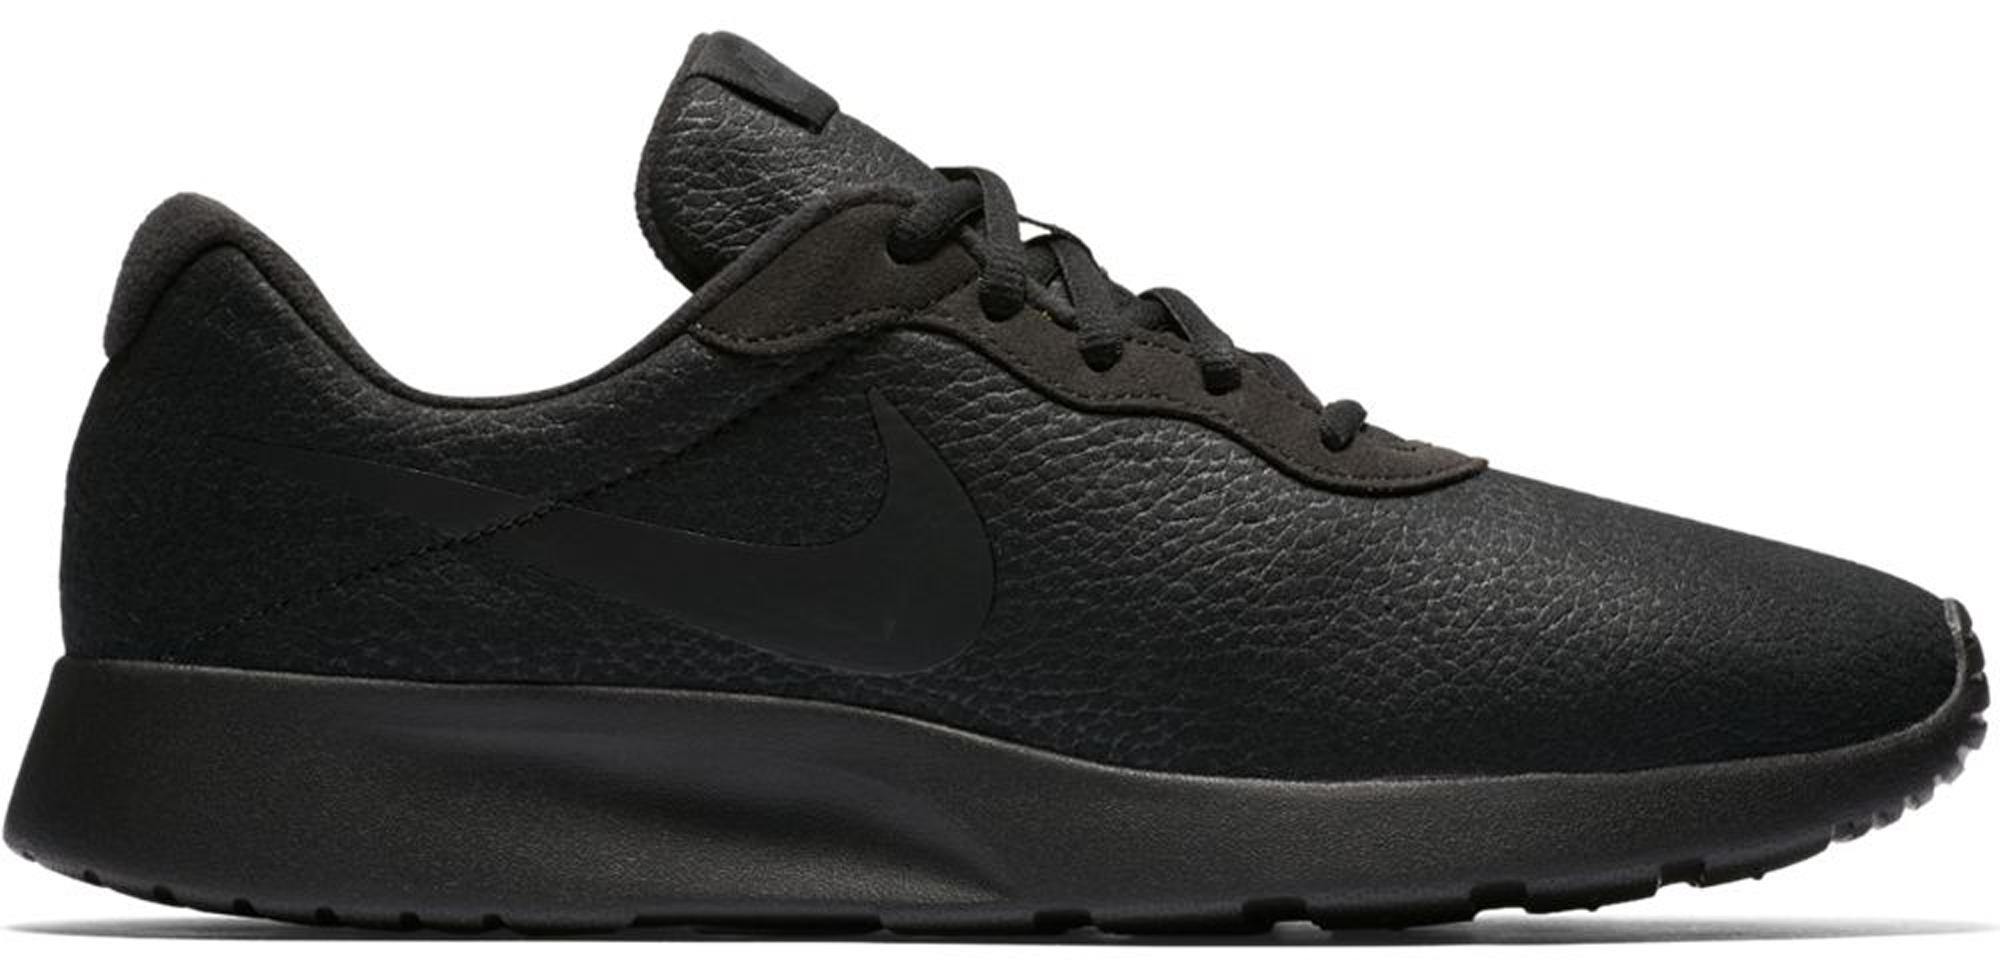 Nike Tanjun Premium Black Leather